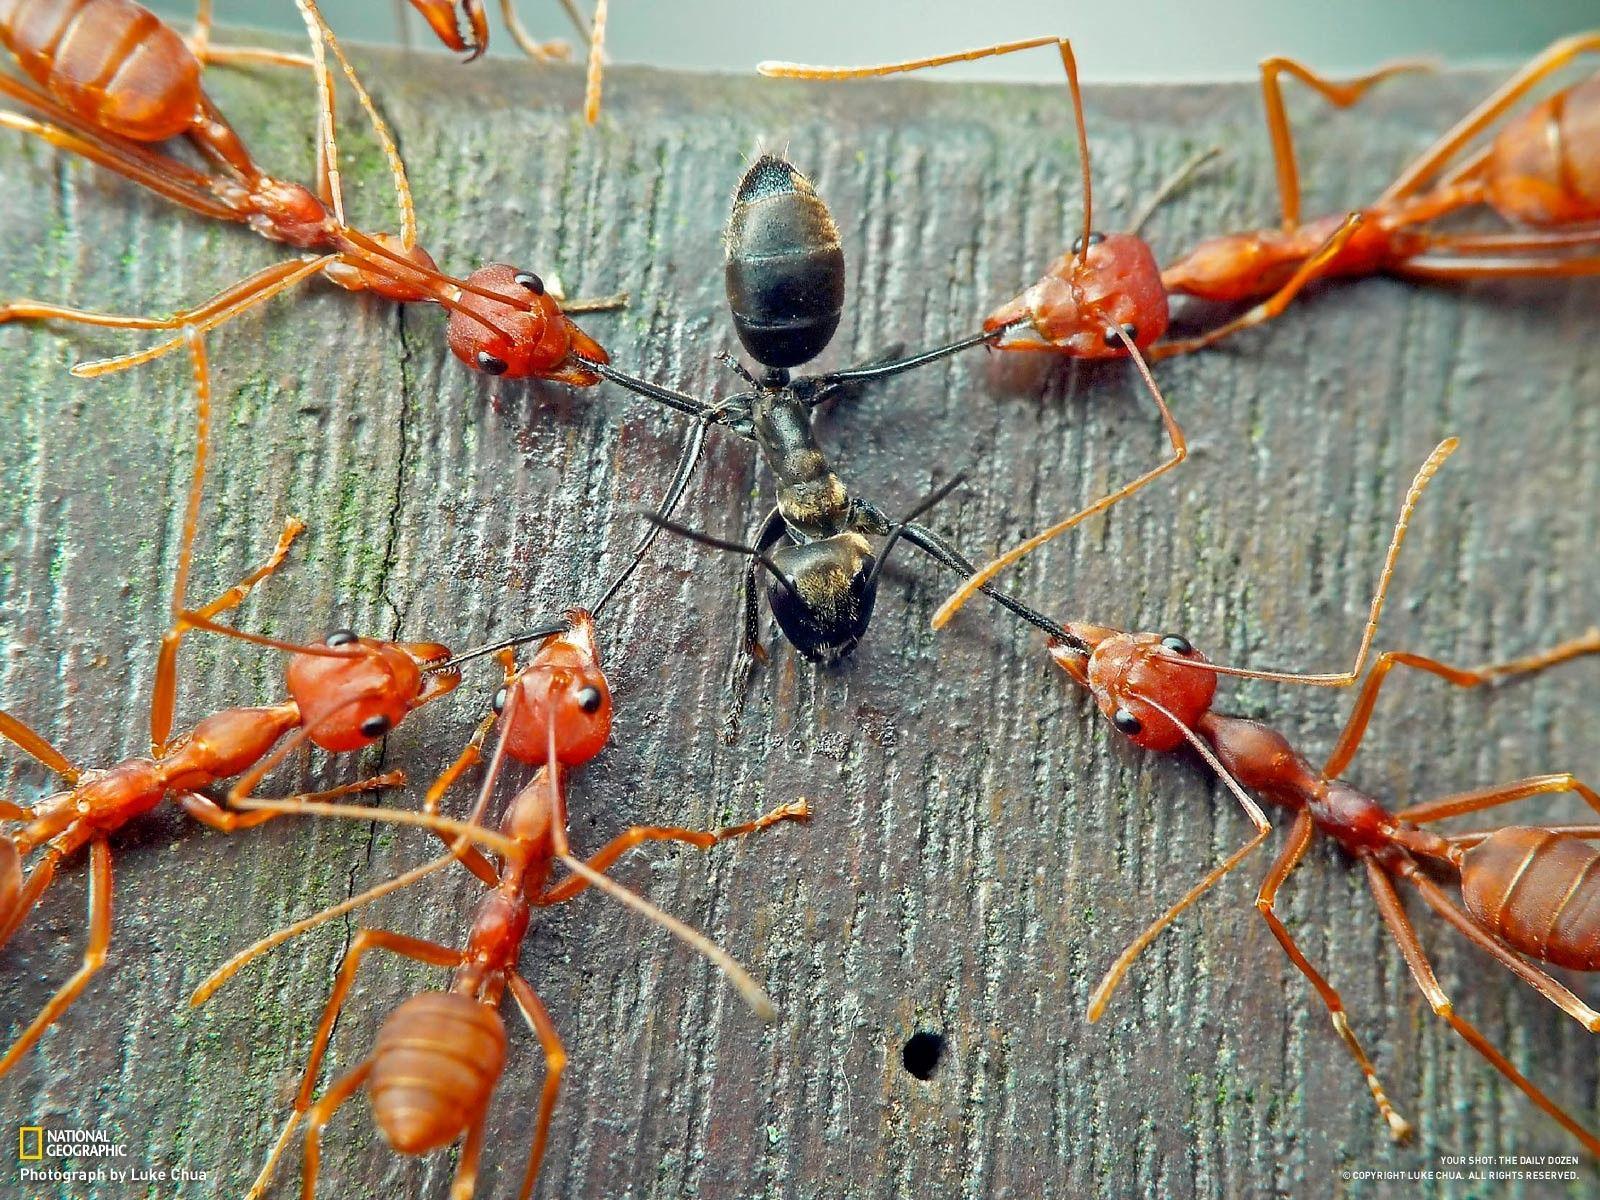 Red Ants Vs Black Ant Ameisen Ameisenarten Insekten